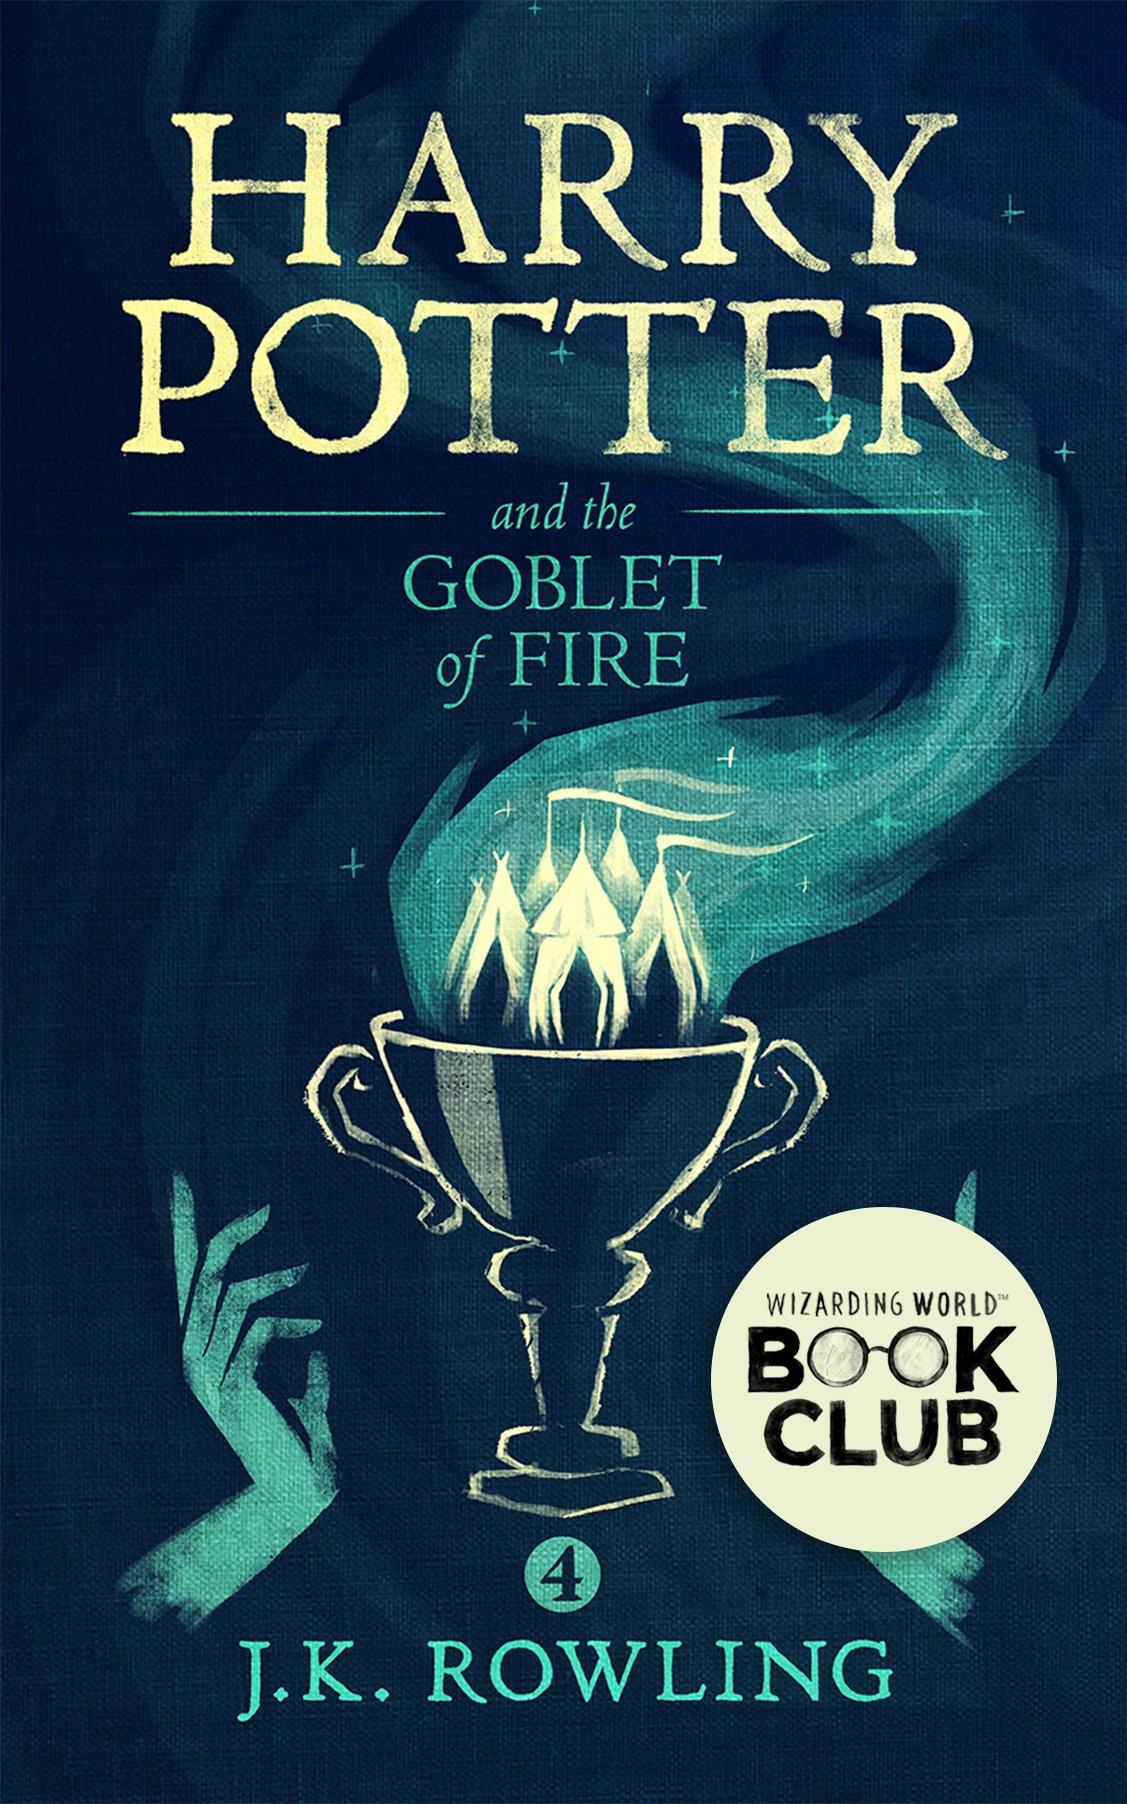 Harry Potter Ebook Ita Gratis